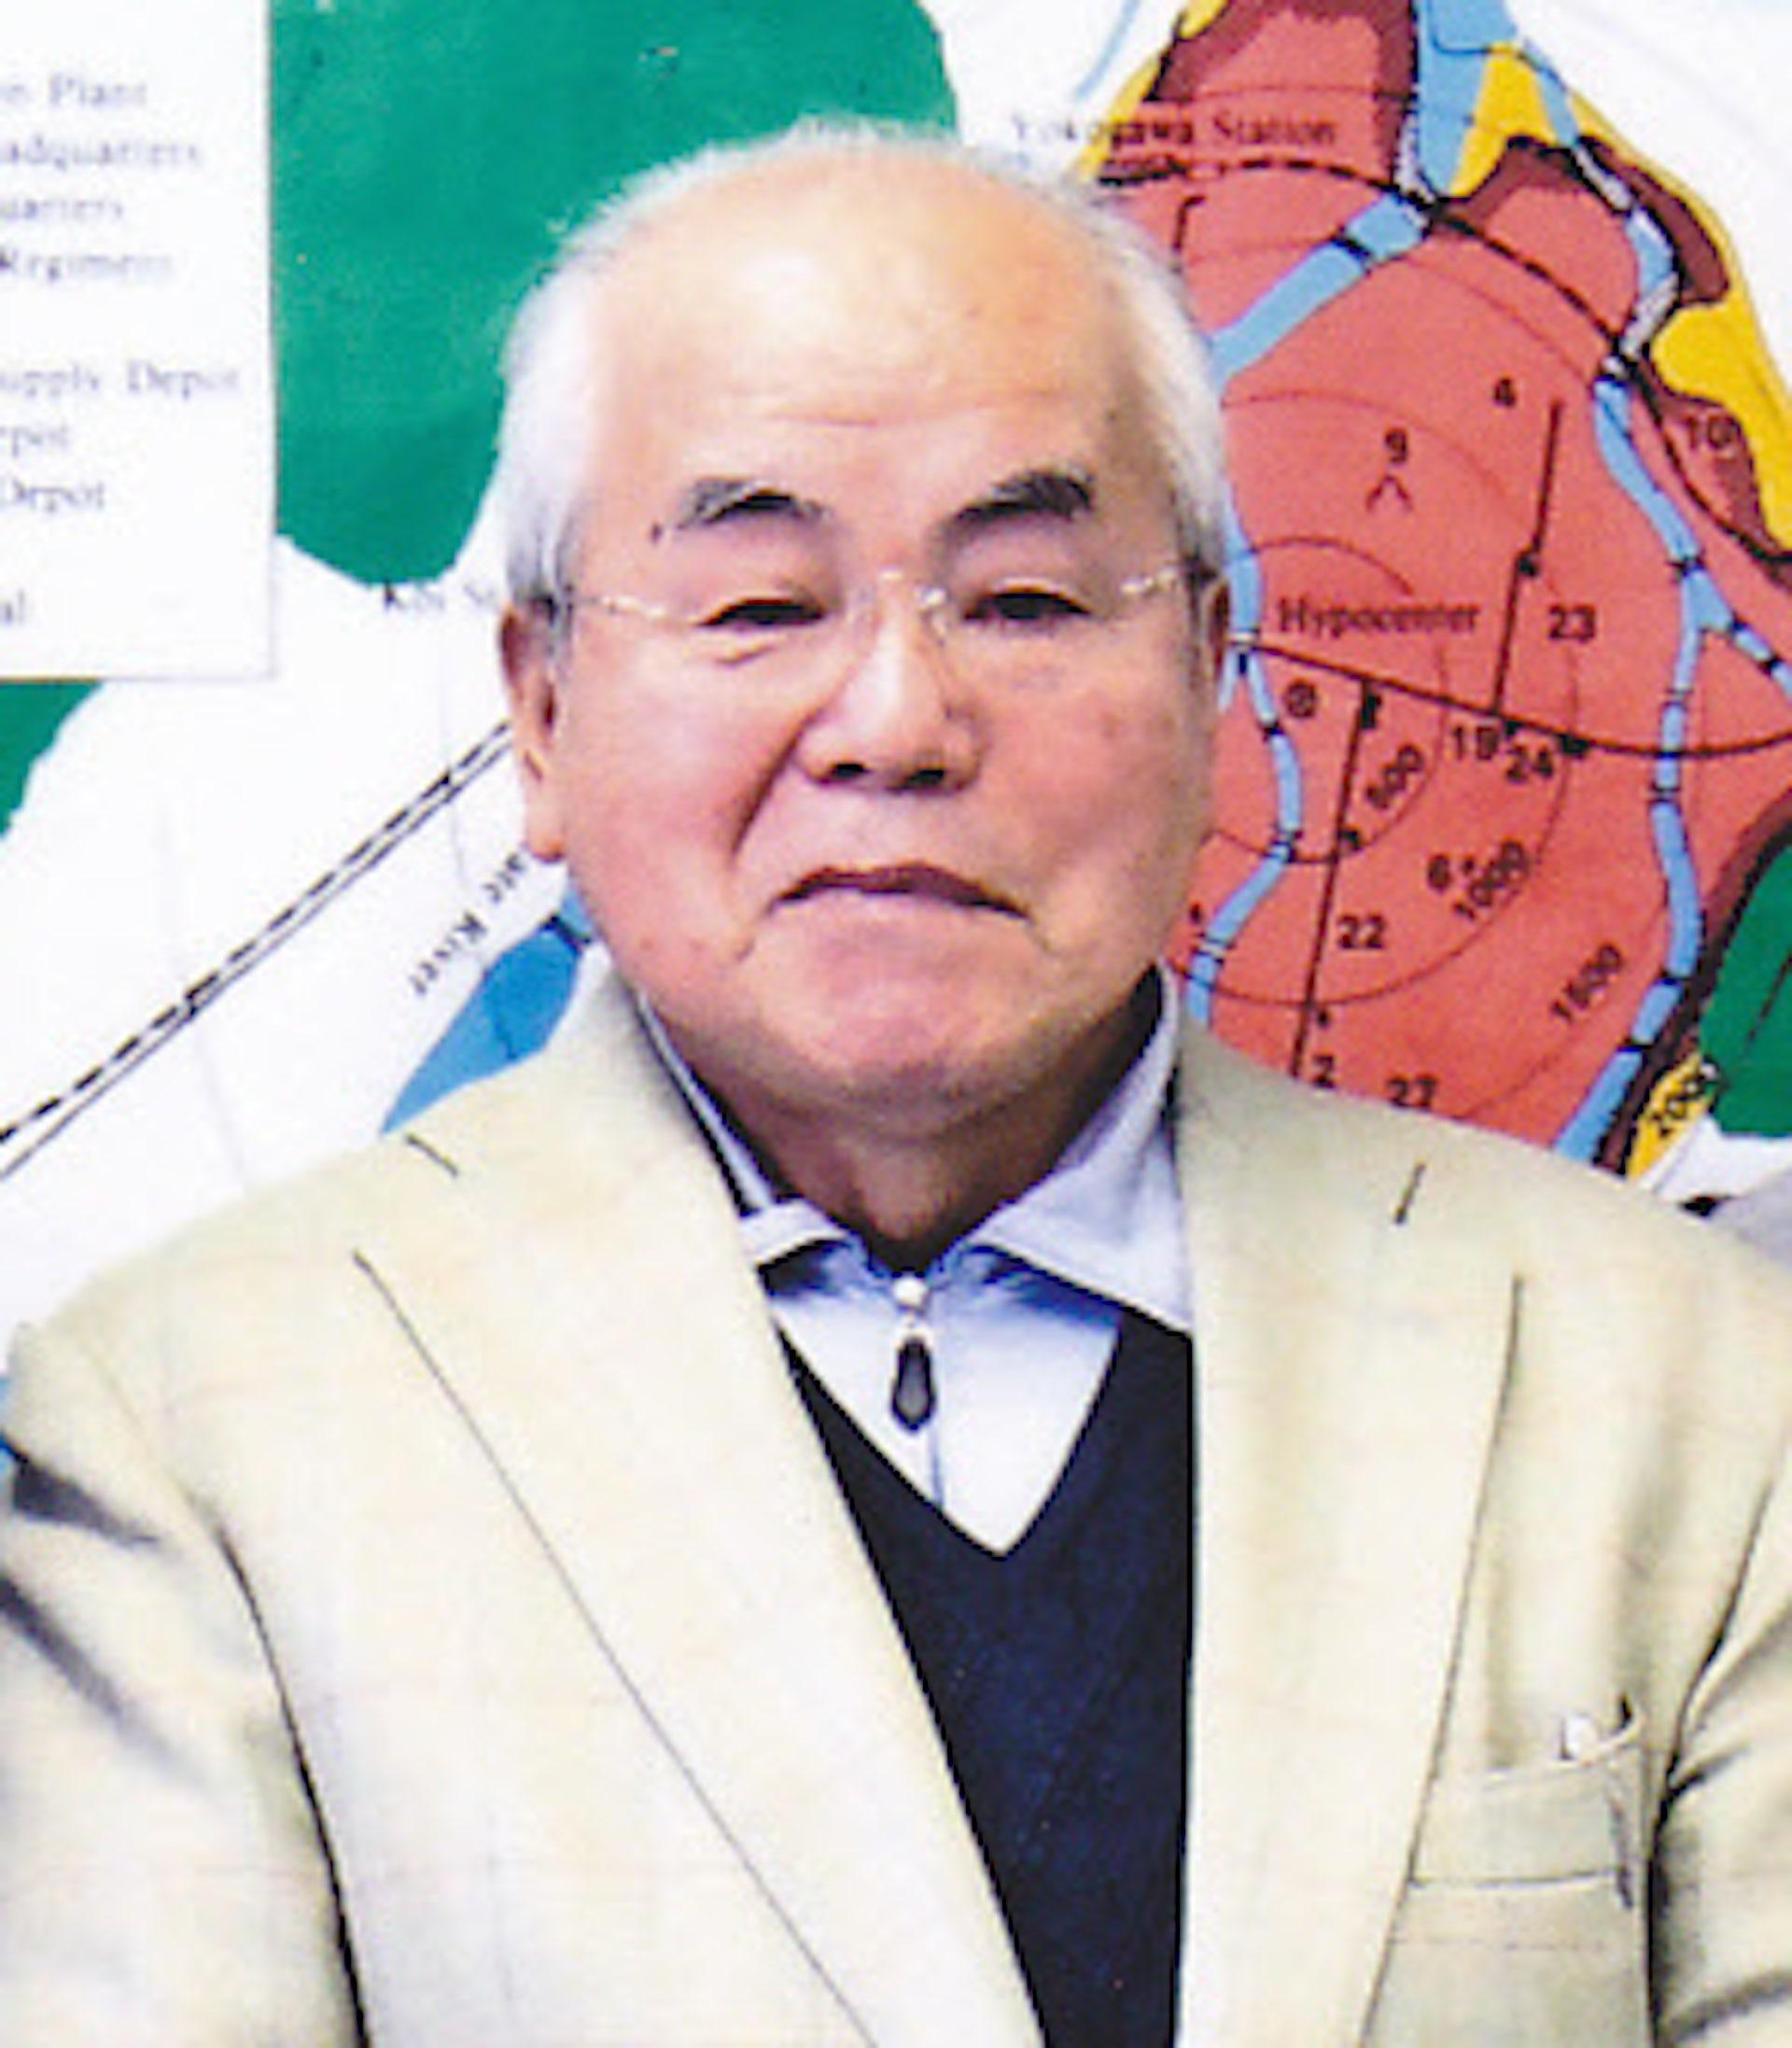 Shoso Kawamoto